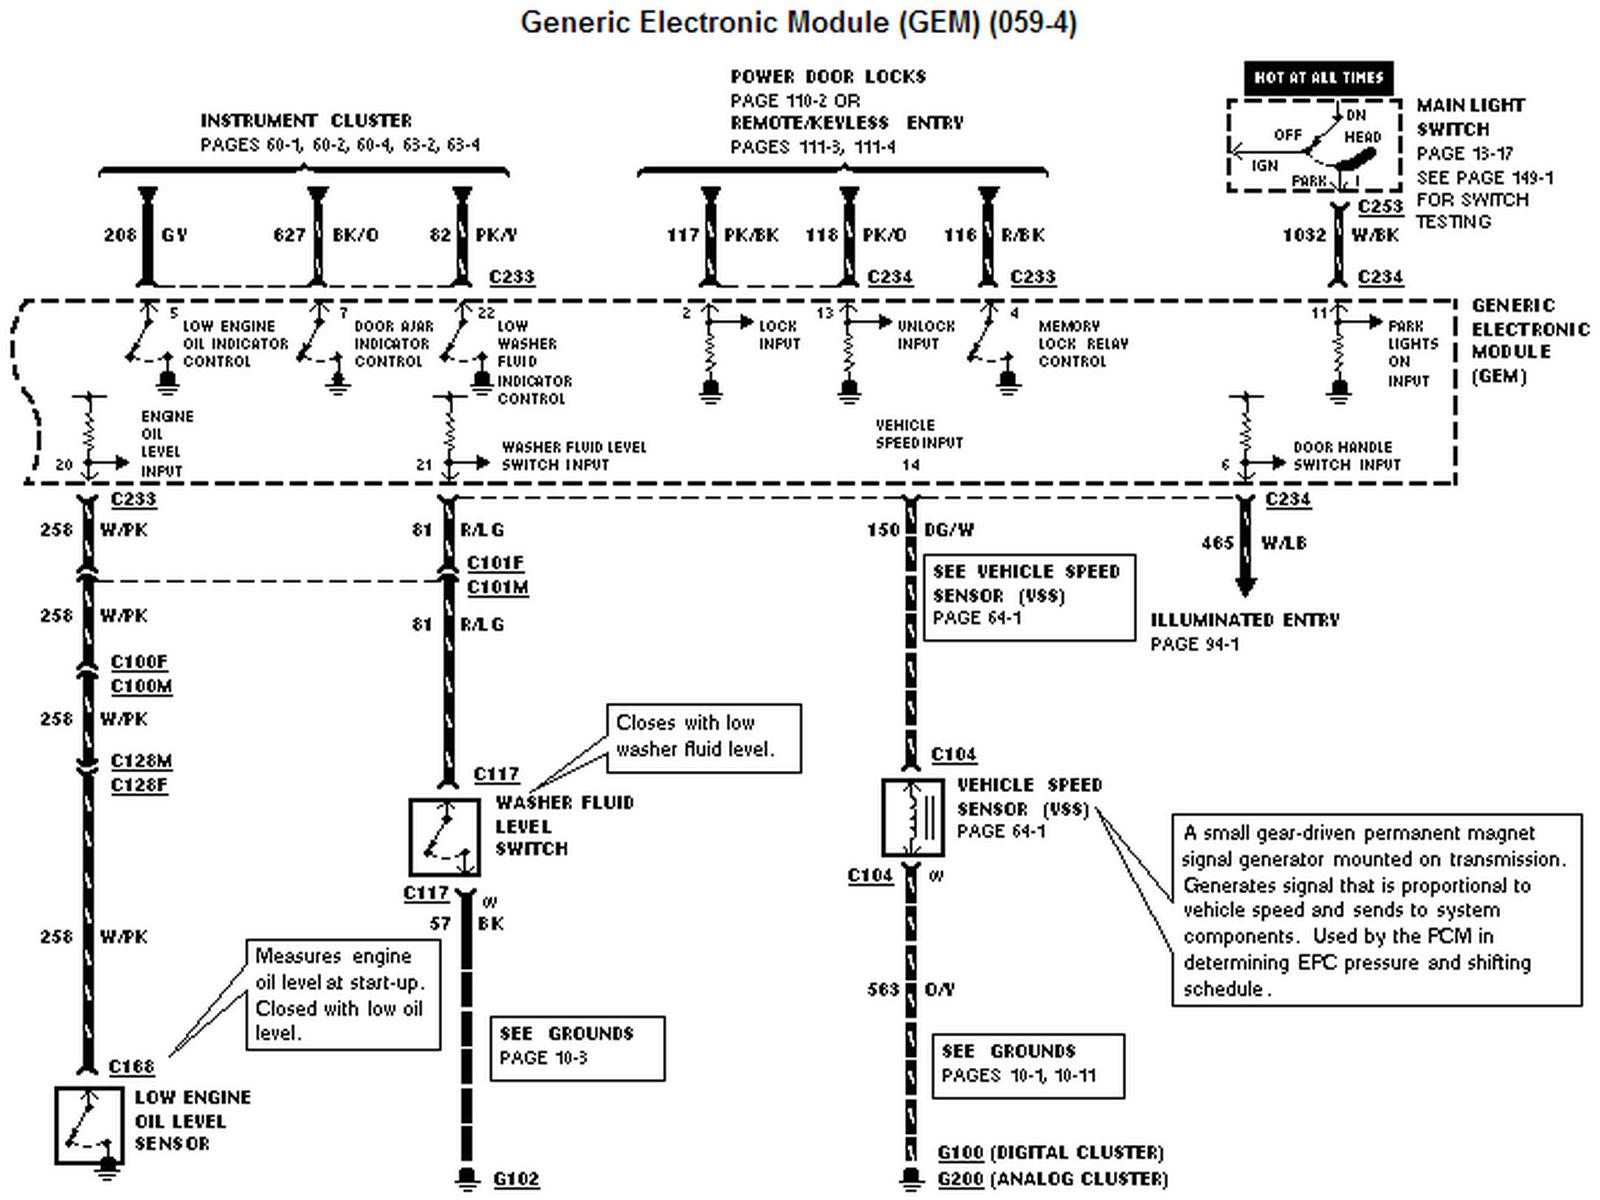 Diagram 2000 Ford Windstar Power Windows Wiring Diagram Full Version Hd Quality Wiring Diagram Shipwiringl Ripettapalace It